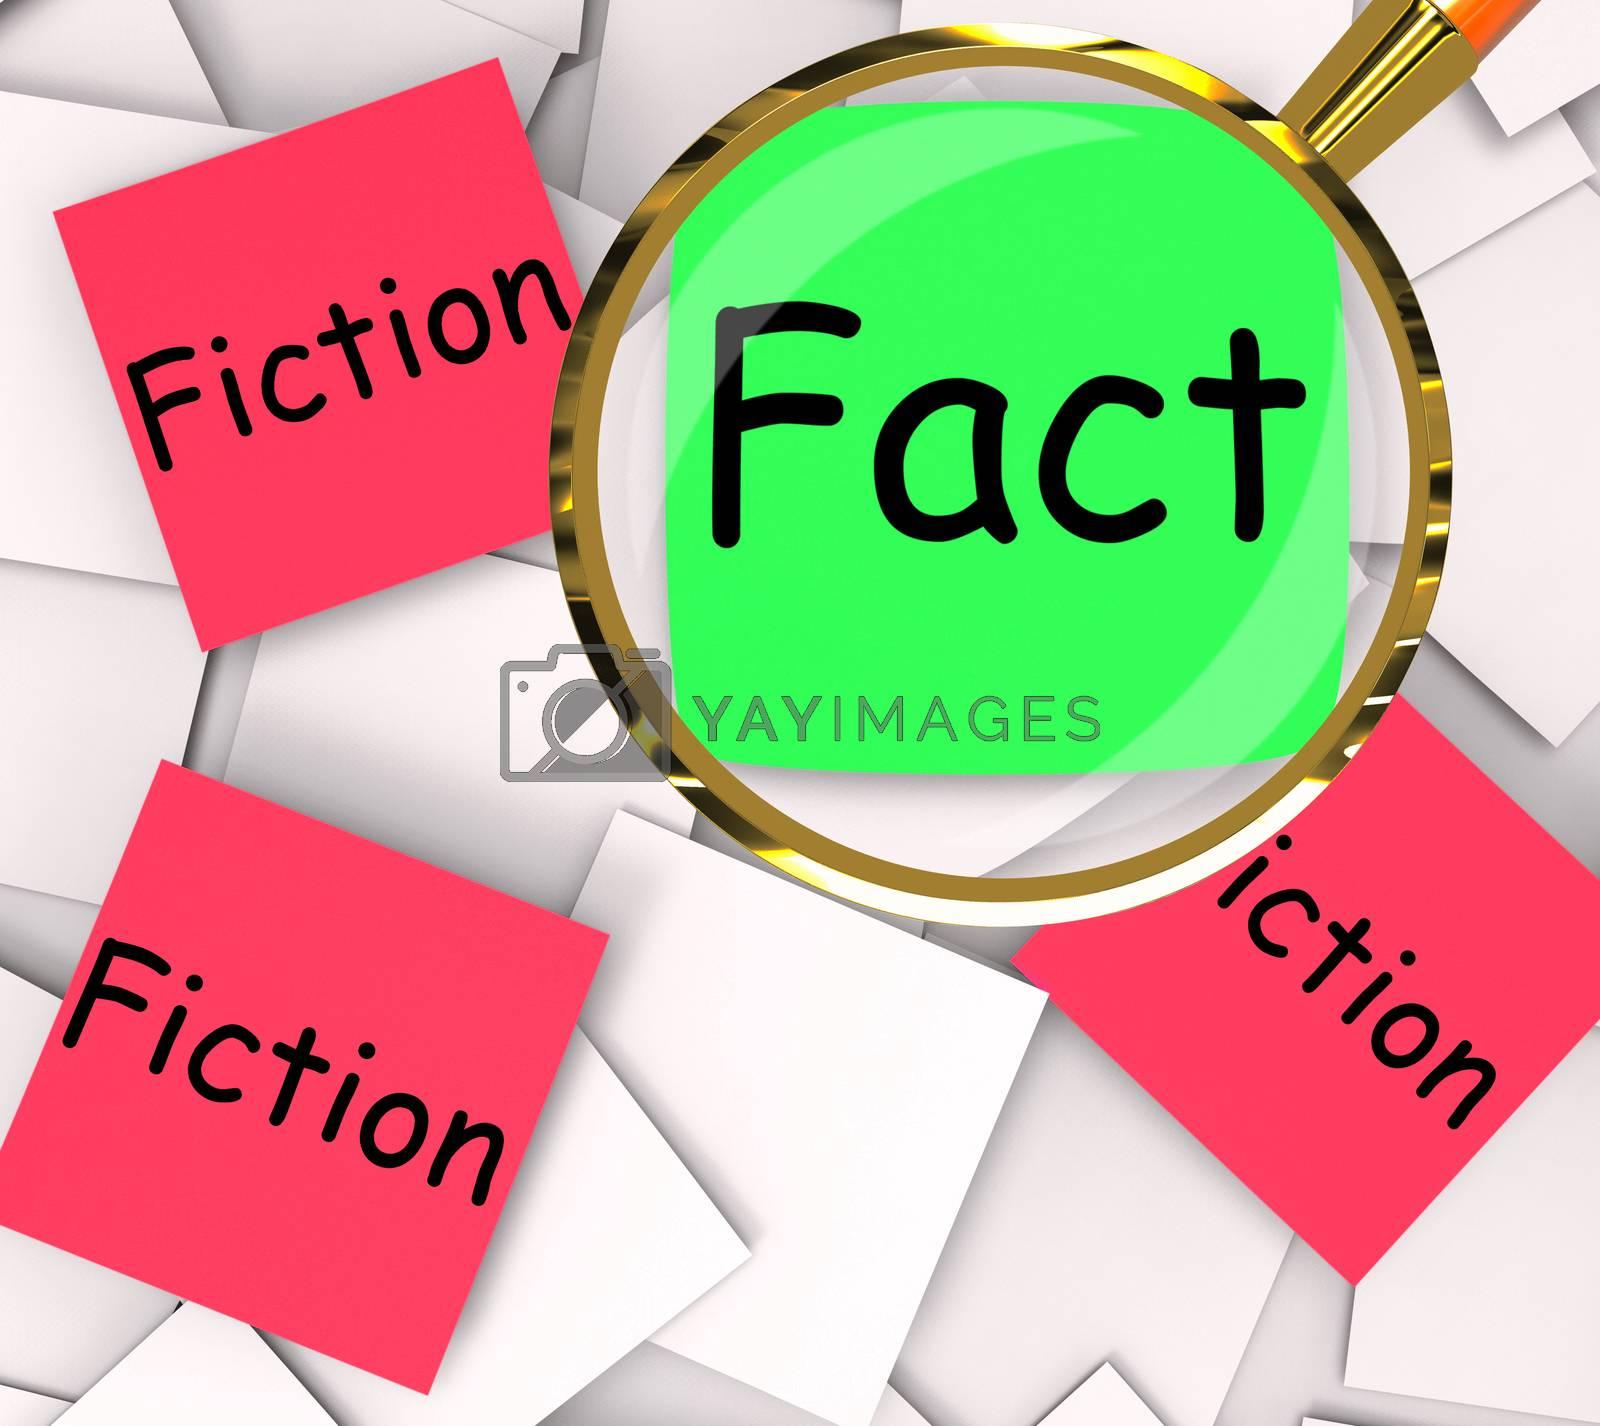 Fact Fiction Post-It Papers Show Factual Or Untrue by stuartmiles